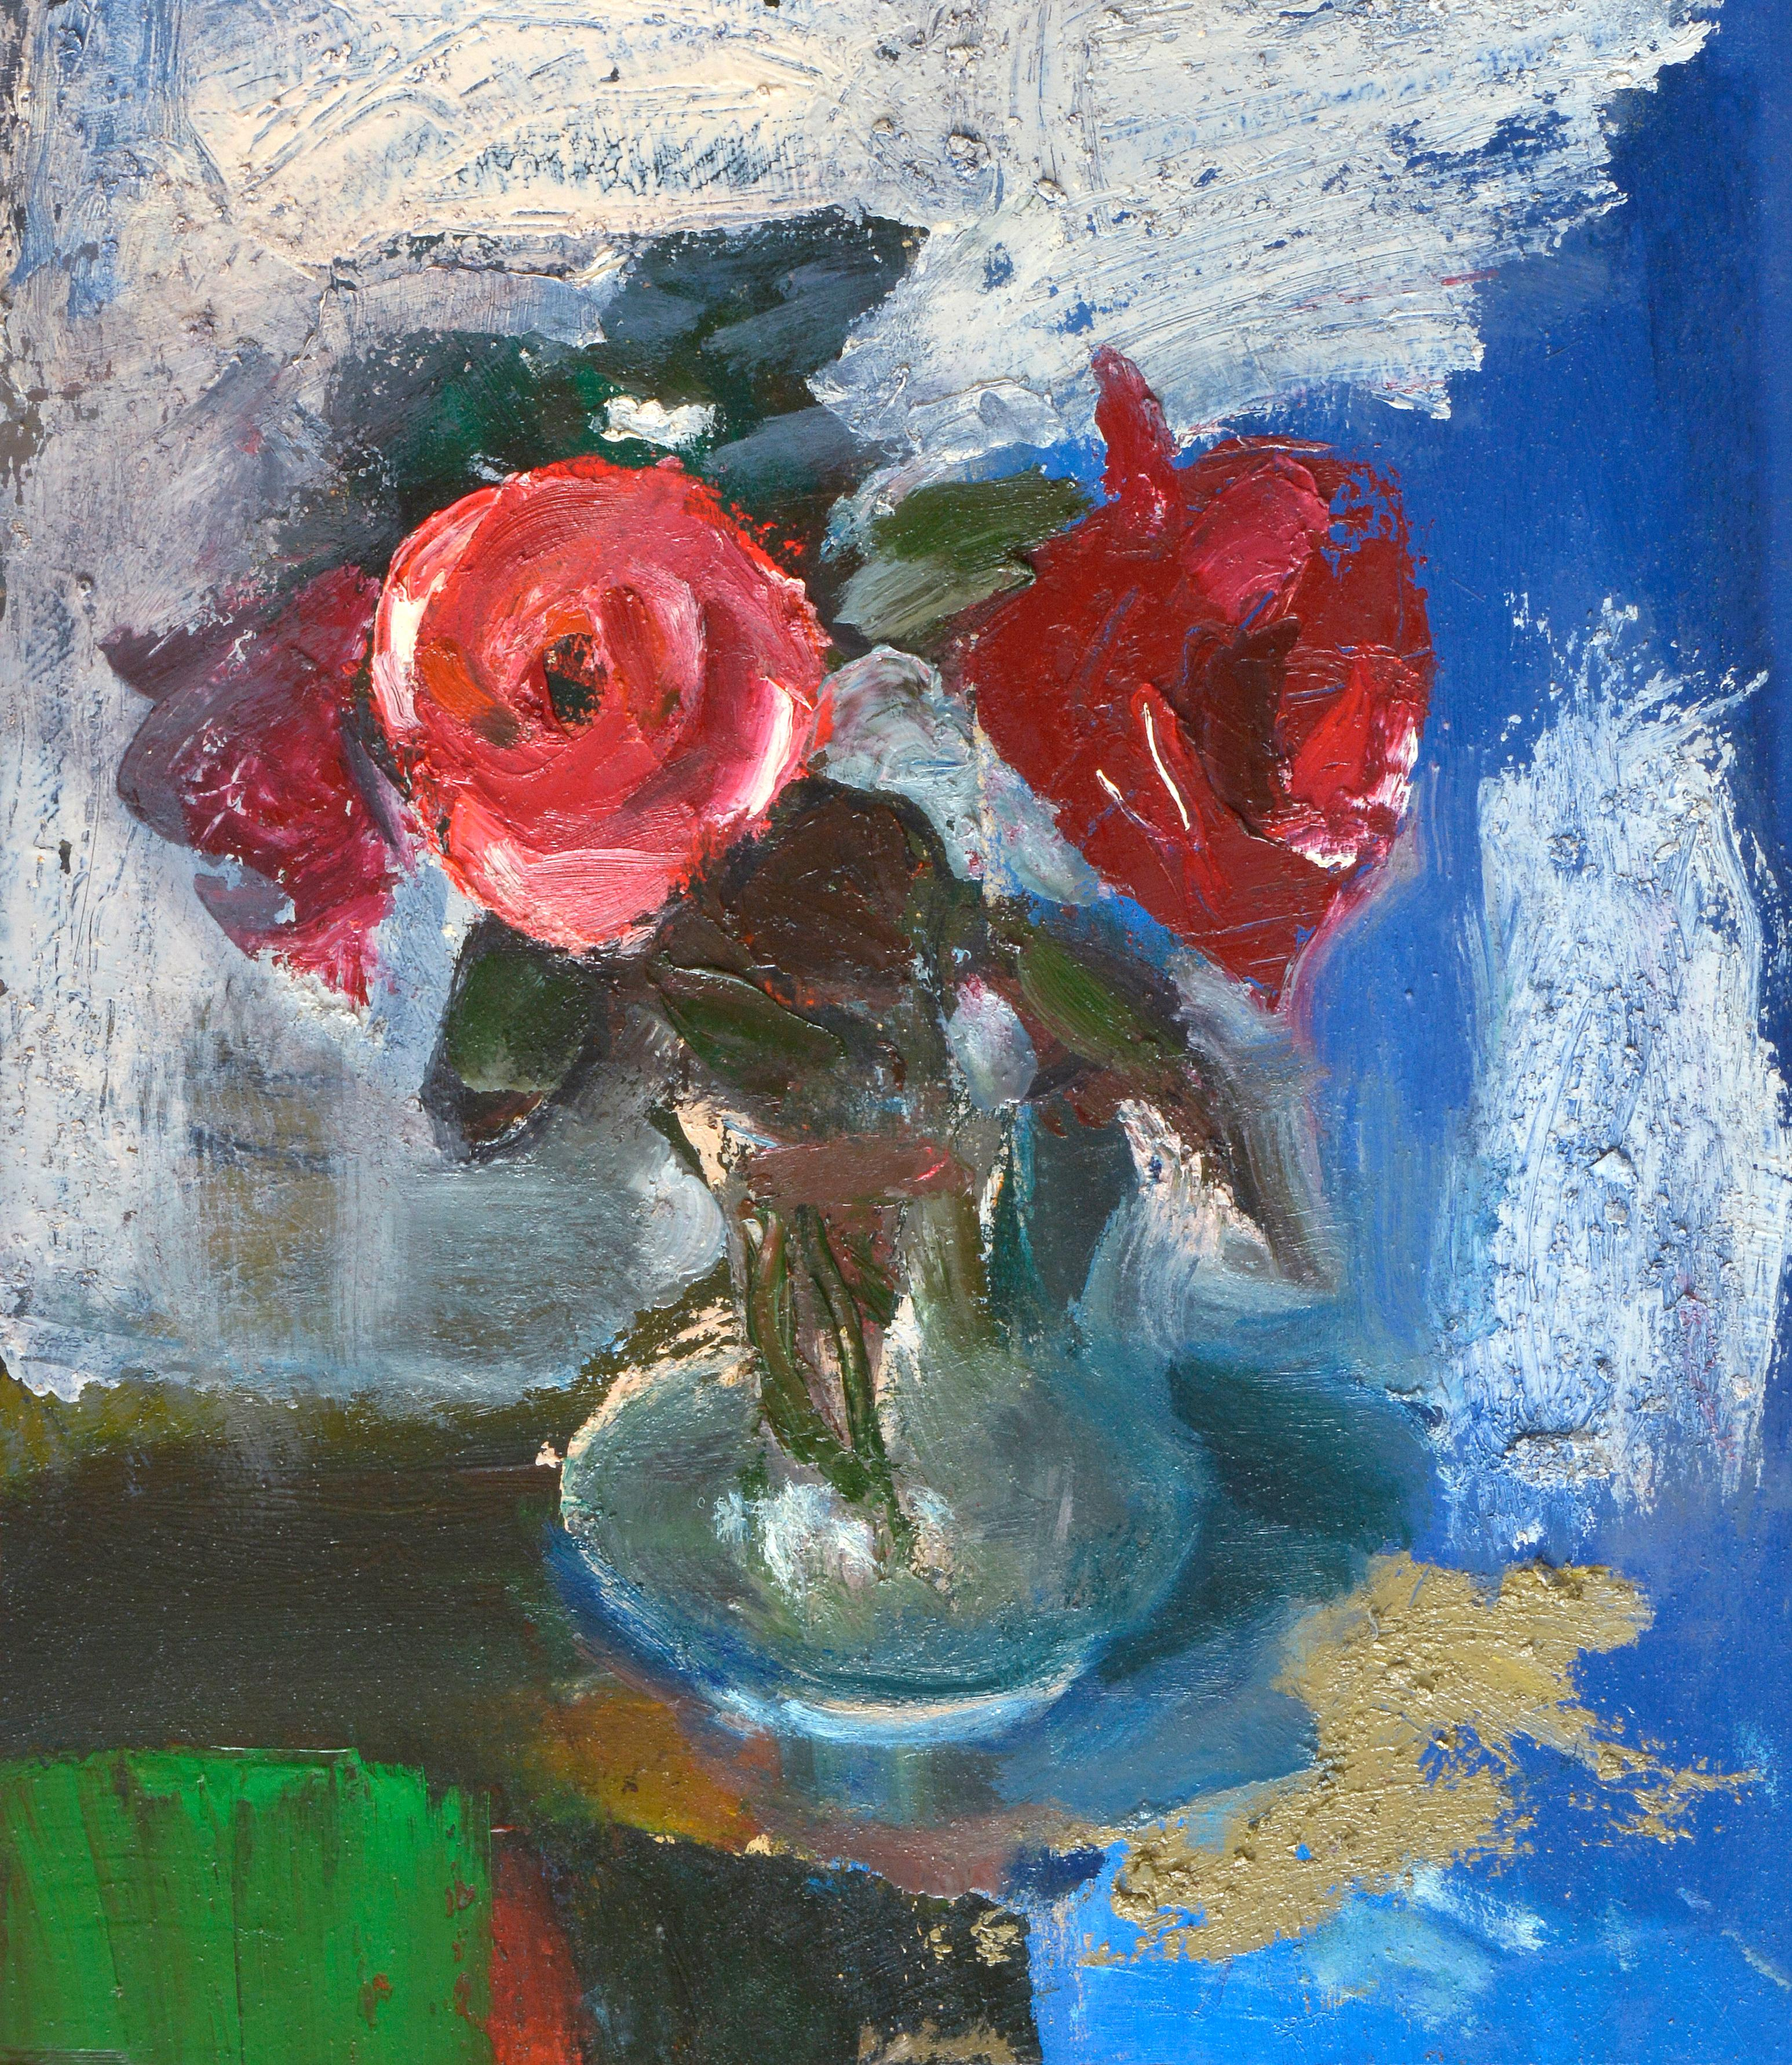 Red roses. Oil on cardboard, 45x40 cm